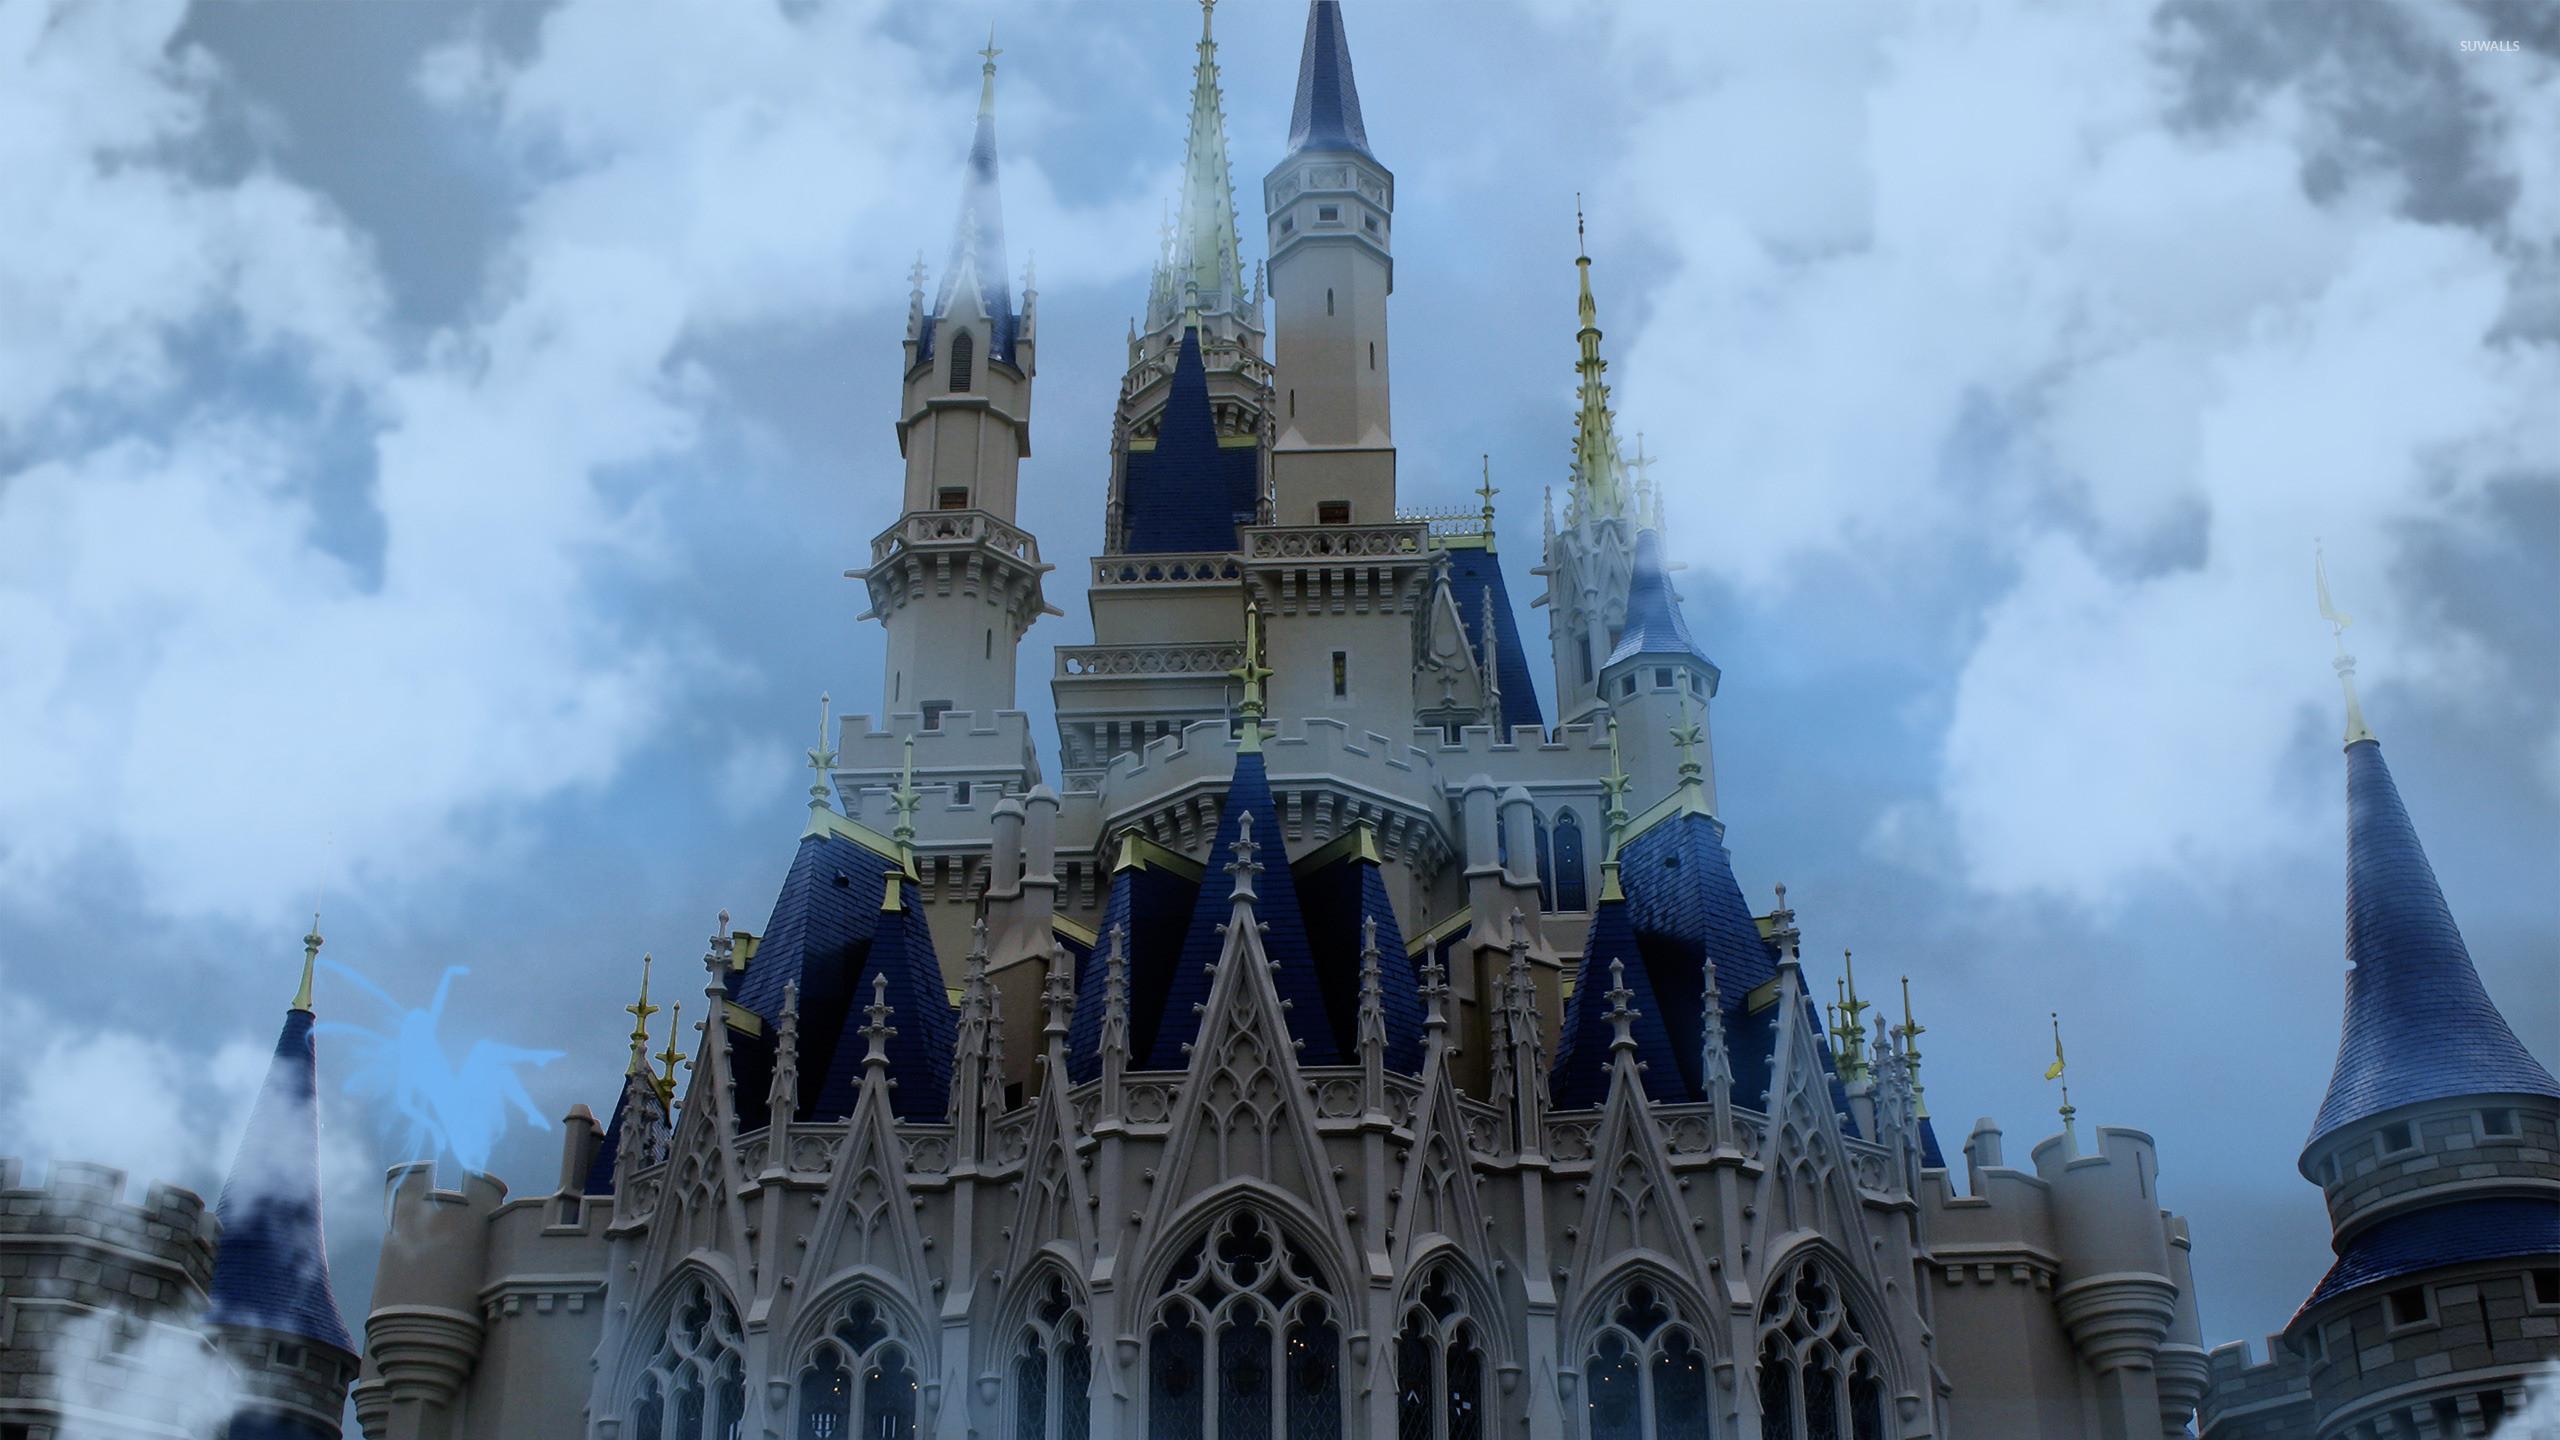 голубой дворец картинки картинки